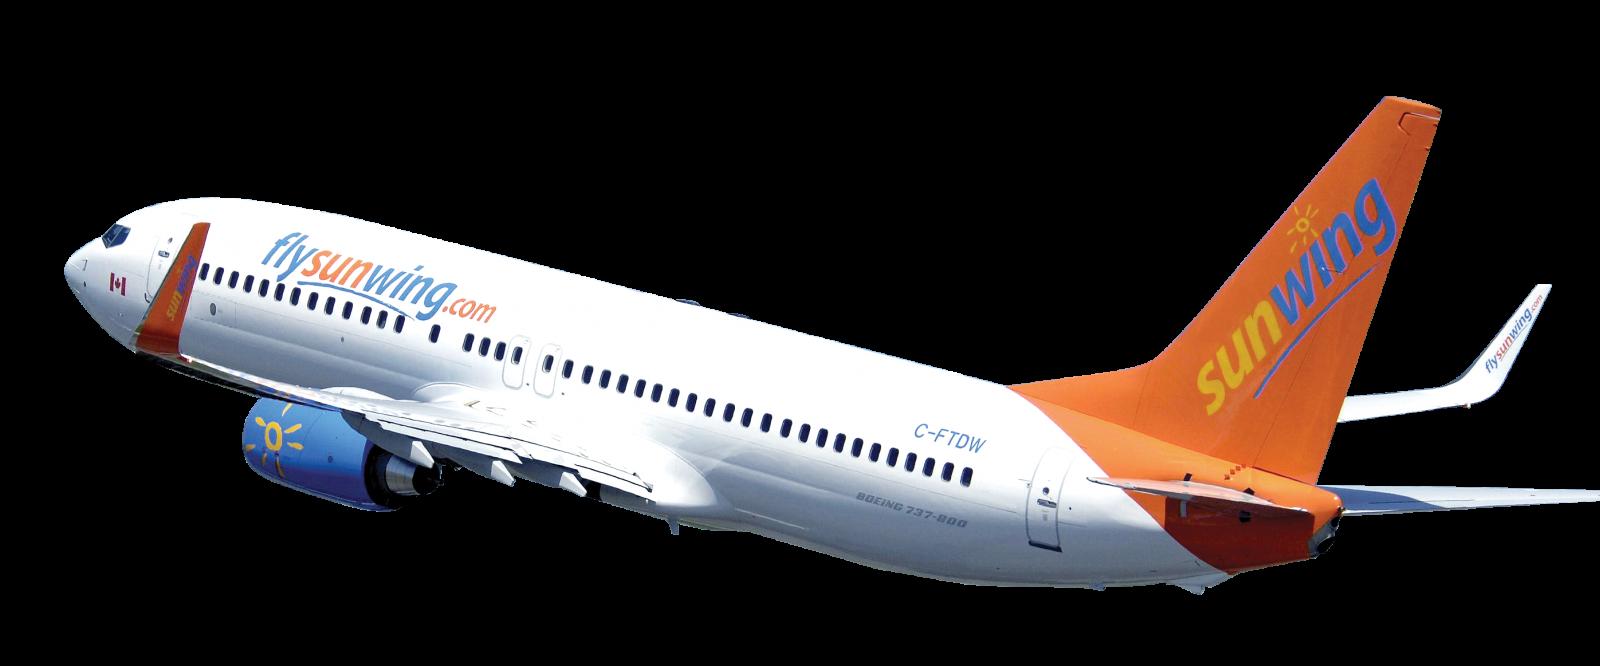 AW-7665403